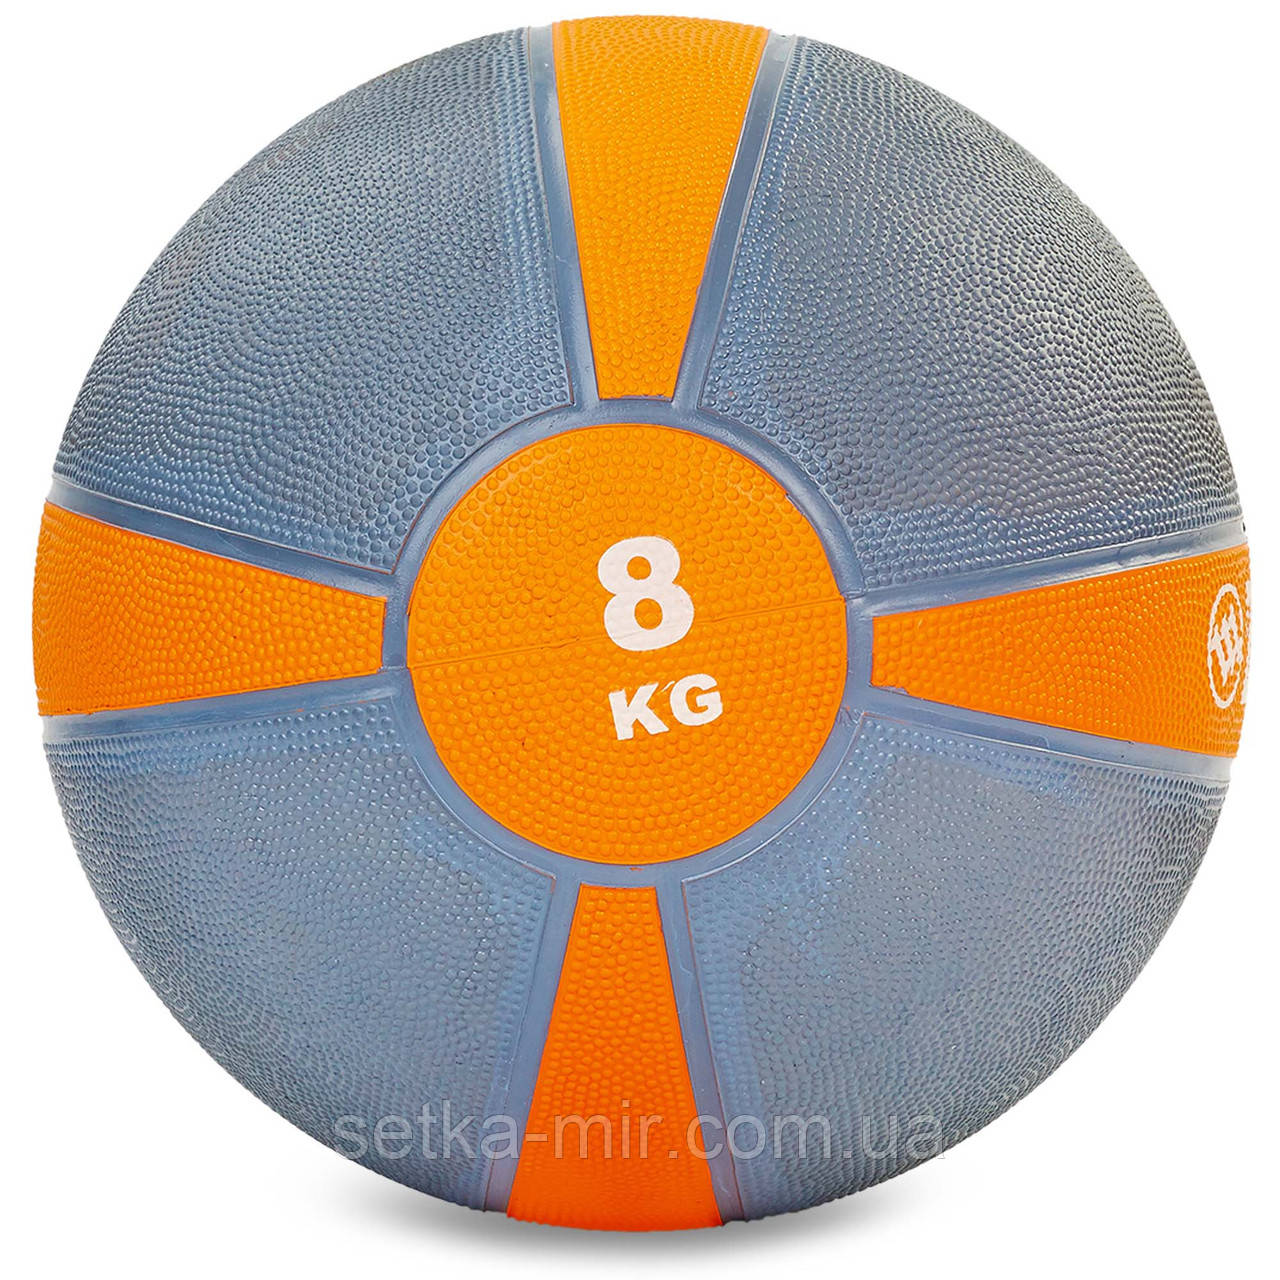 Мяч медицинский медбол Zelart Medicine Ball FI-5122-8 8кг